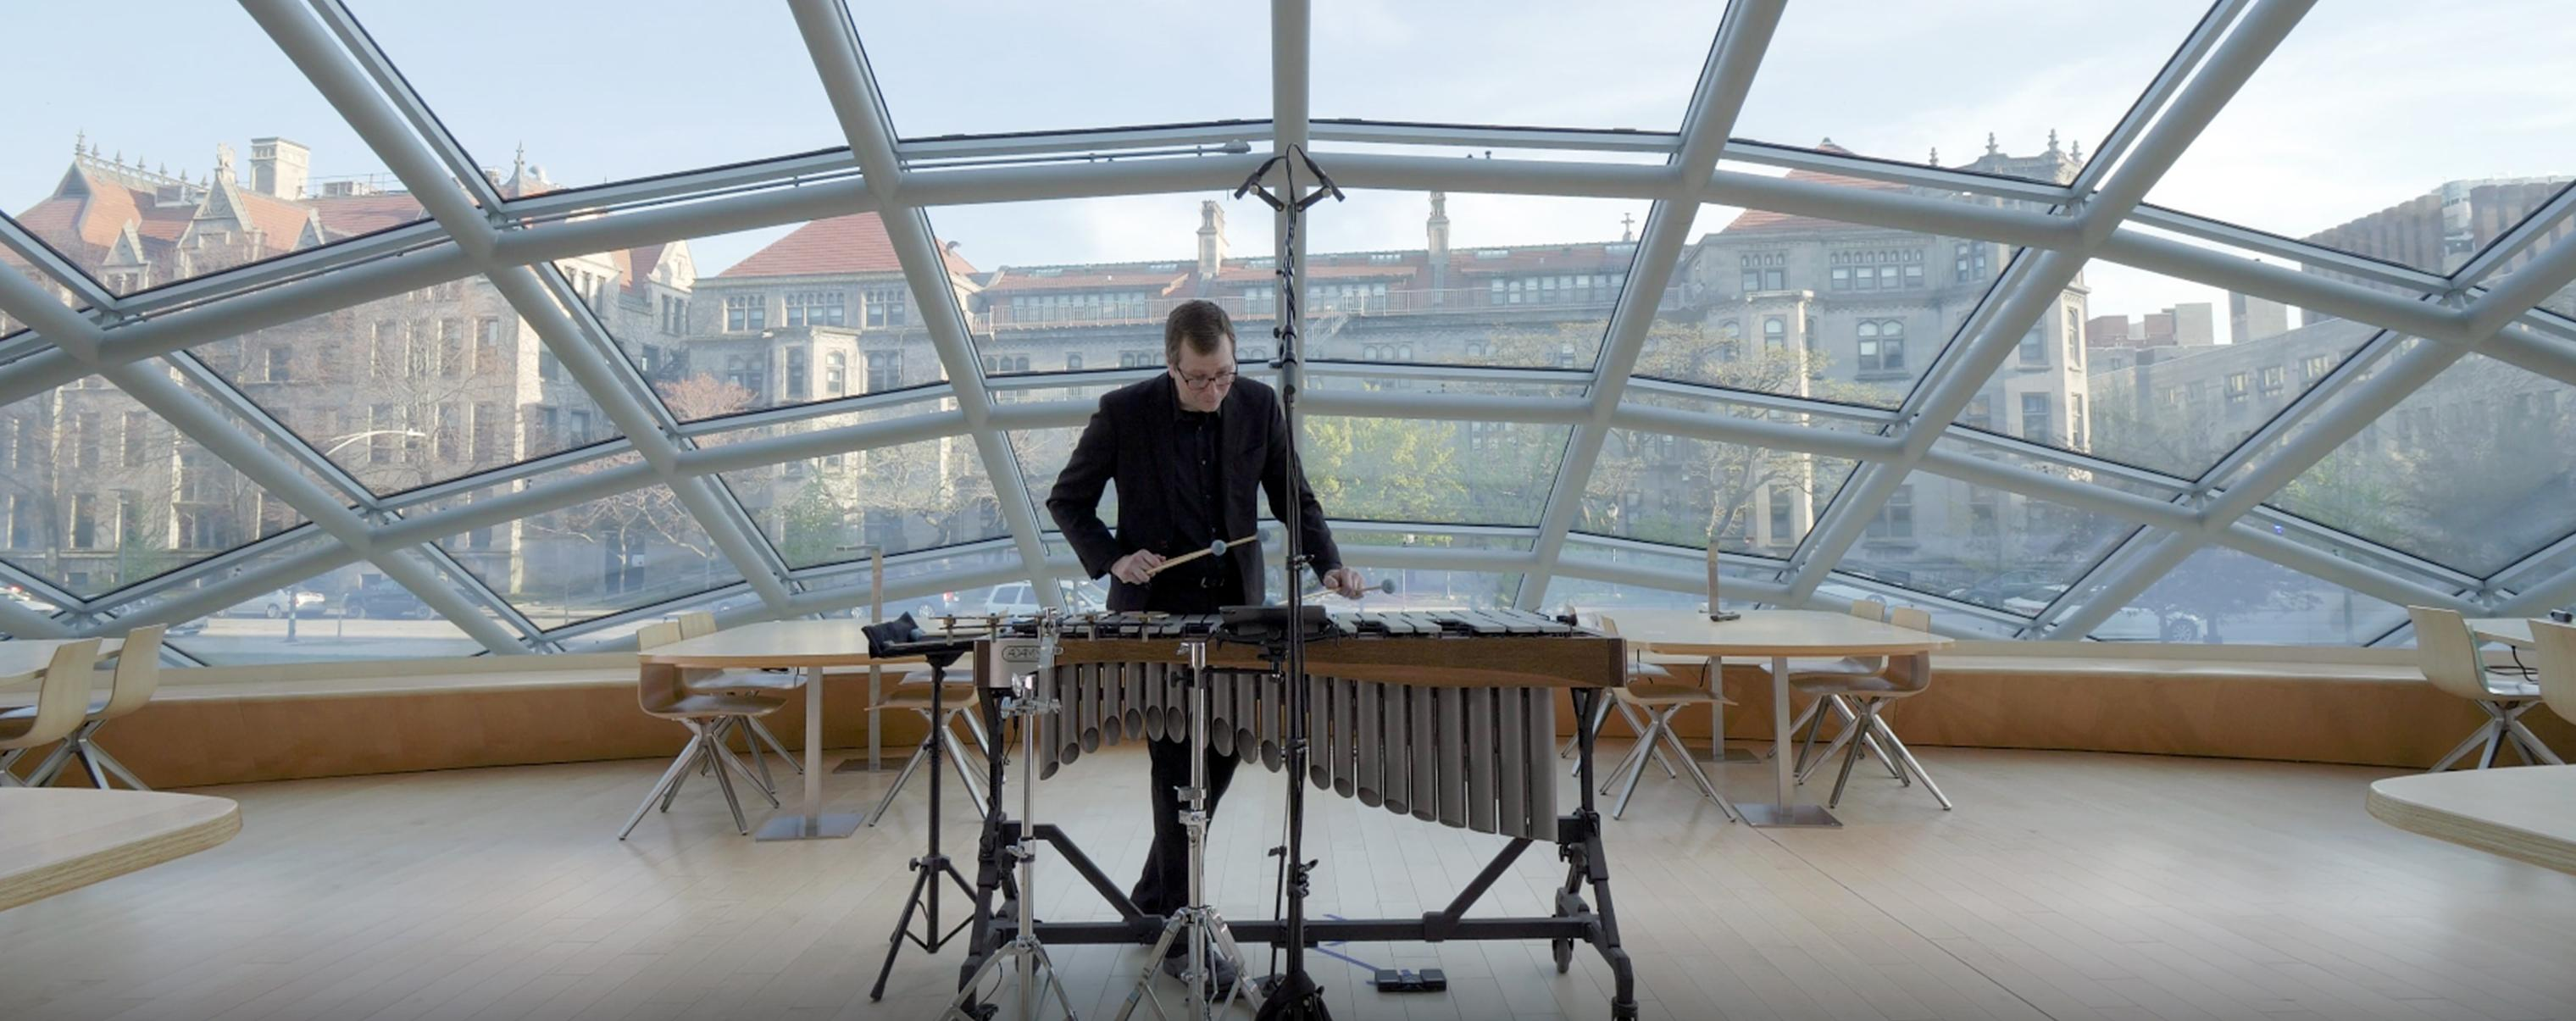 Hyde Park Herald praises John Corkill's SOUND/SITES performance as inventive and unique